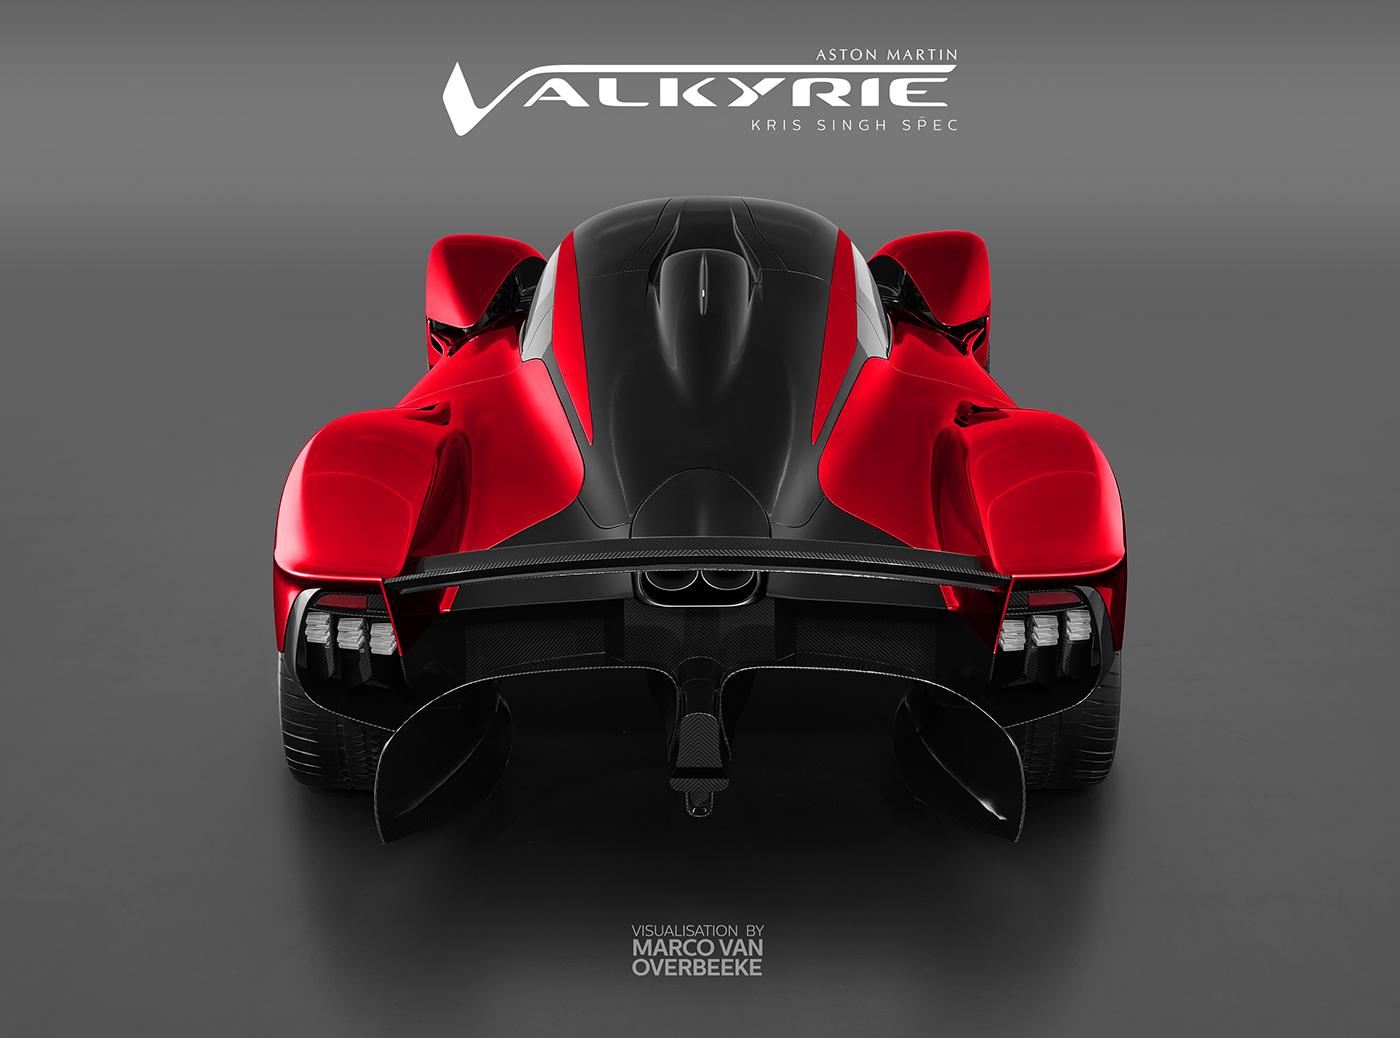 Aston Martin Valkyrie Kris Singh Custom Spec On Behance